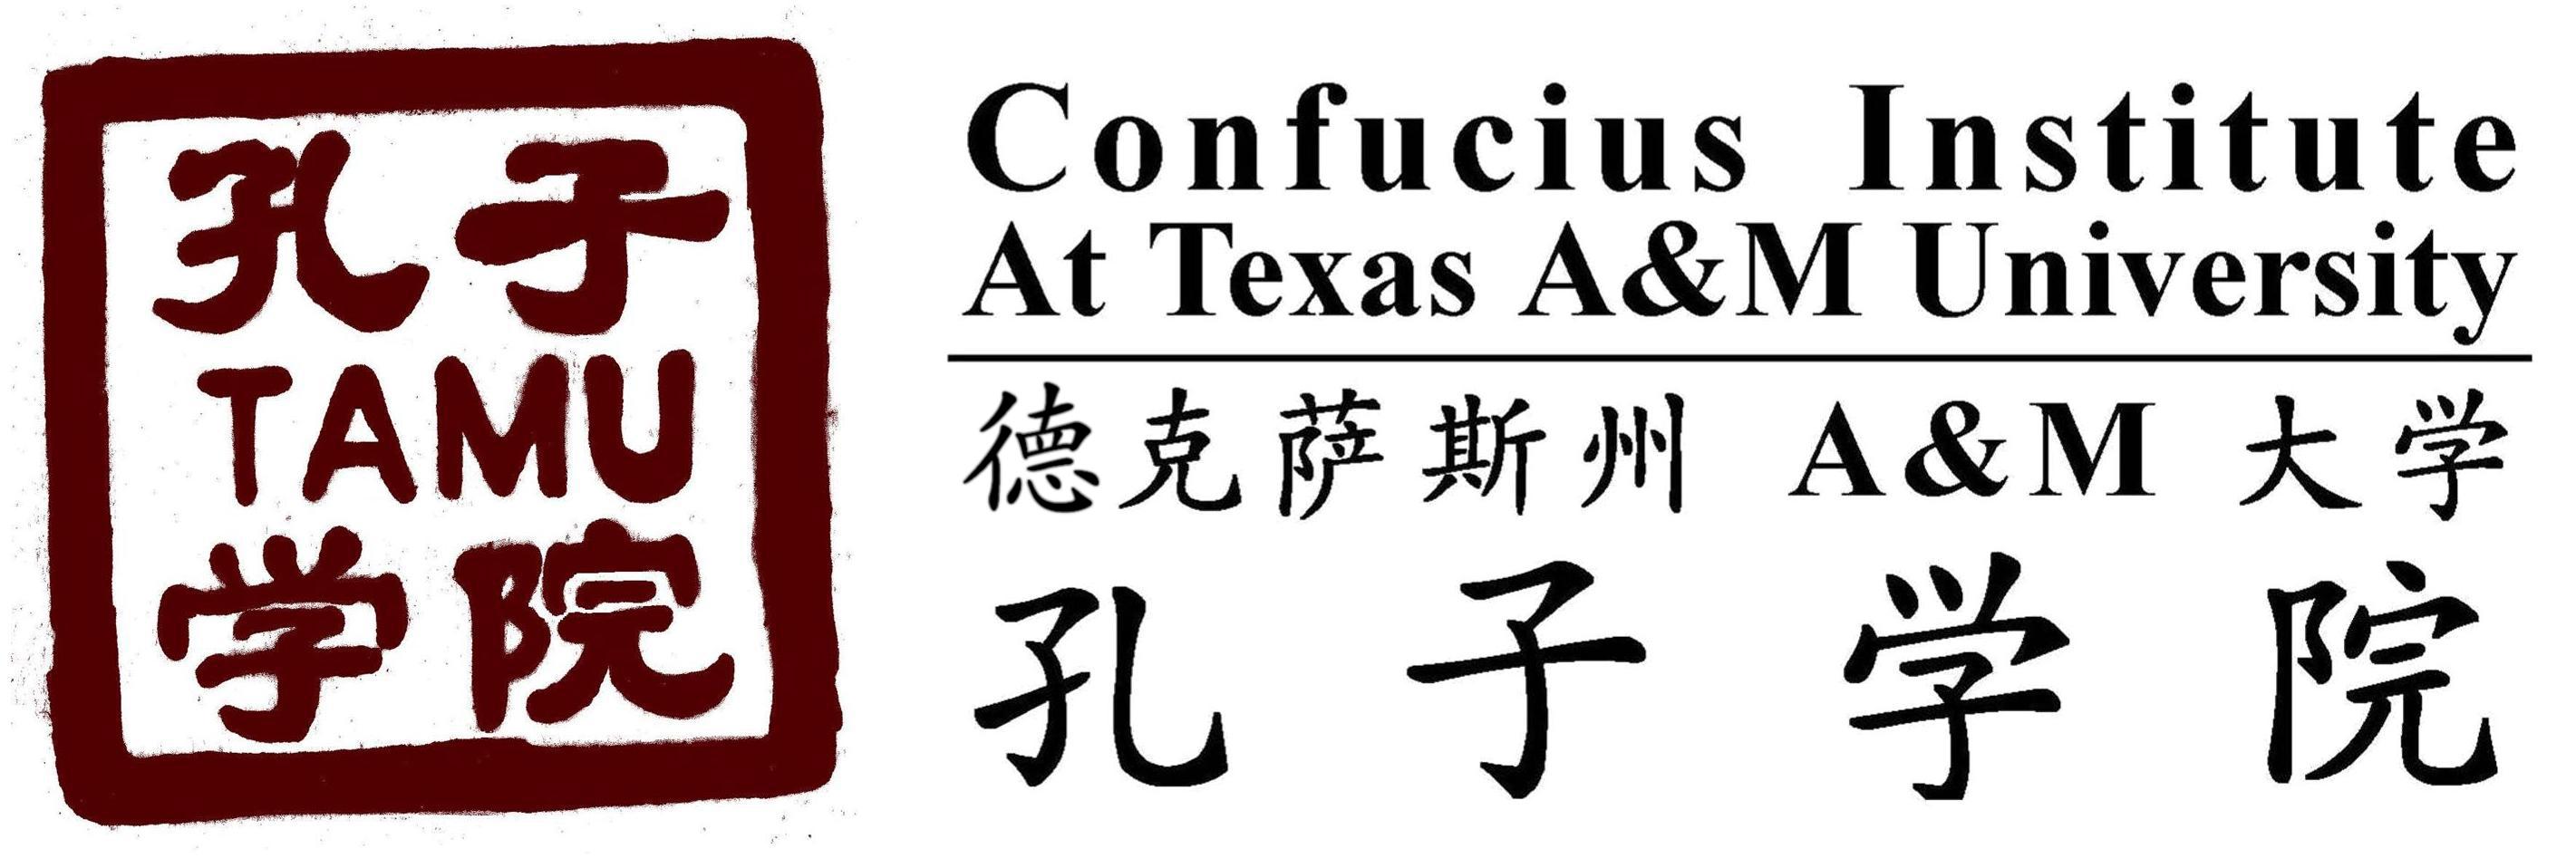 Correct CI Logo-A&M